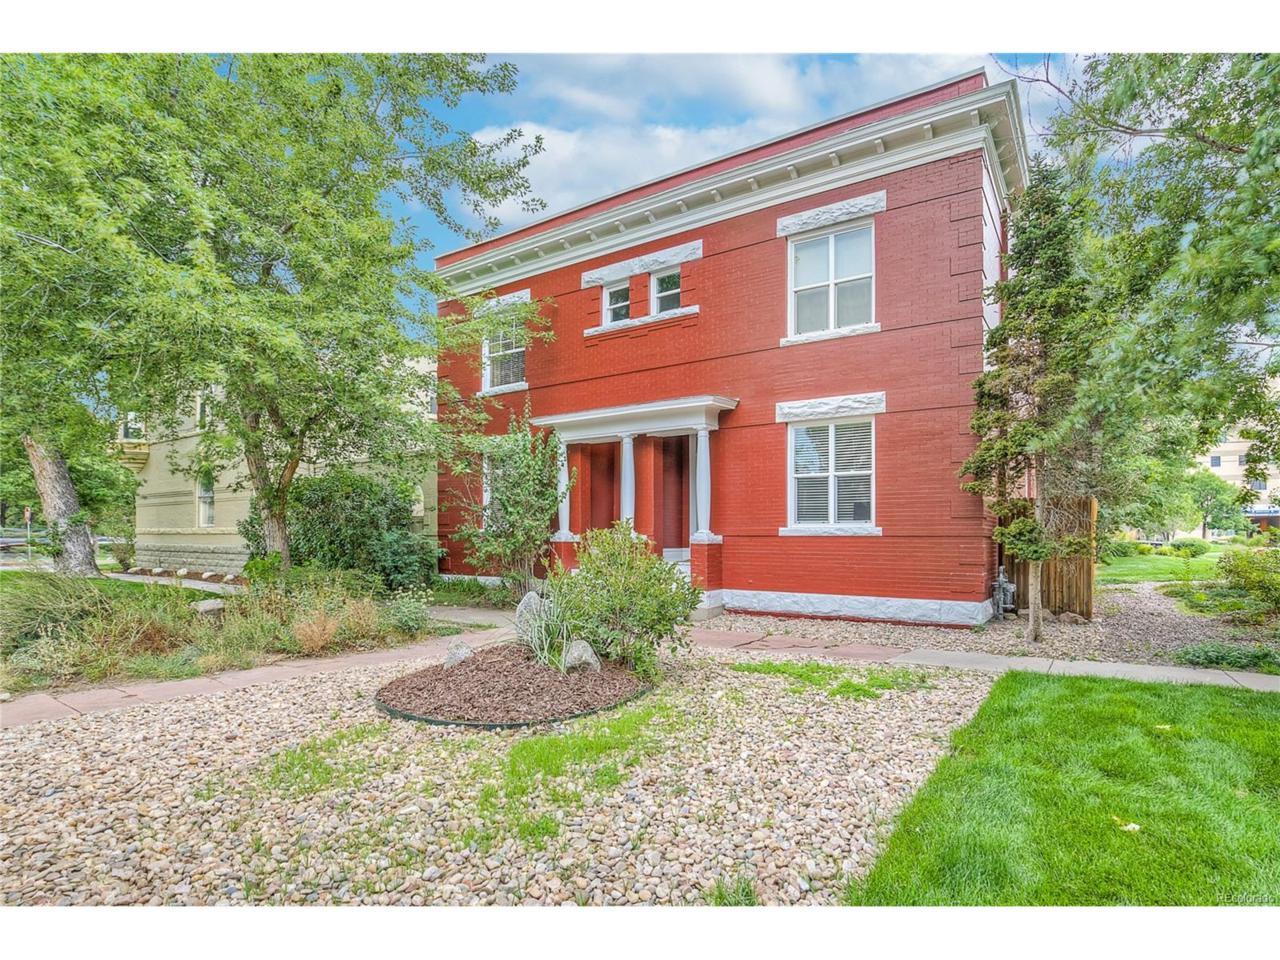 1954 Emerson Street, Denver, CO 80218 (MLS #7815193) :: 8z Real Estate